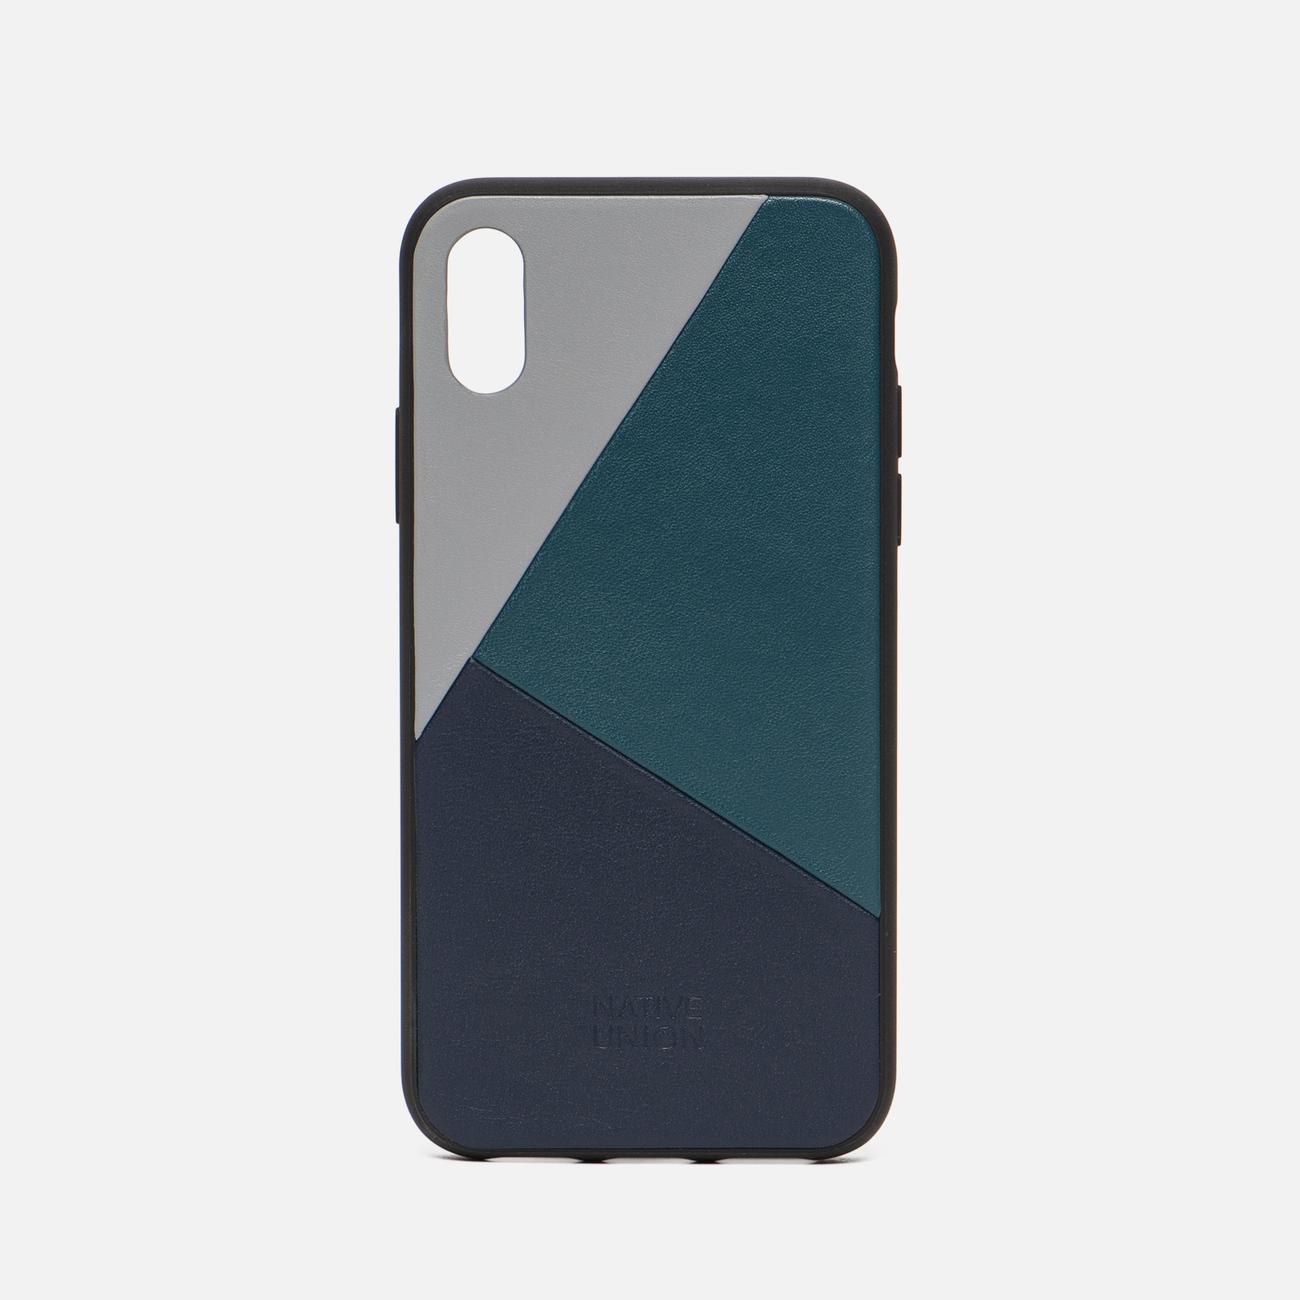 Чехол Native Union Clic Marquetry iPhone X Grey/Dark Green/Dark Blue